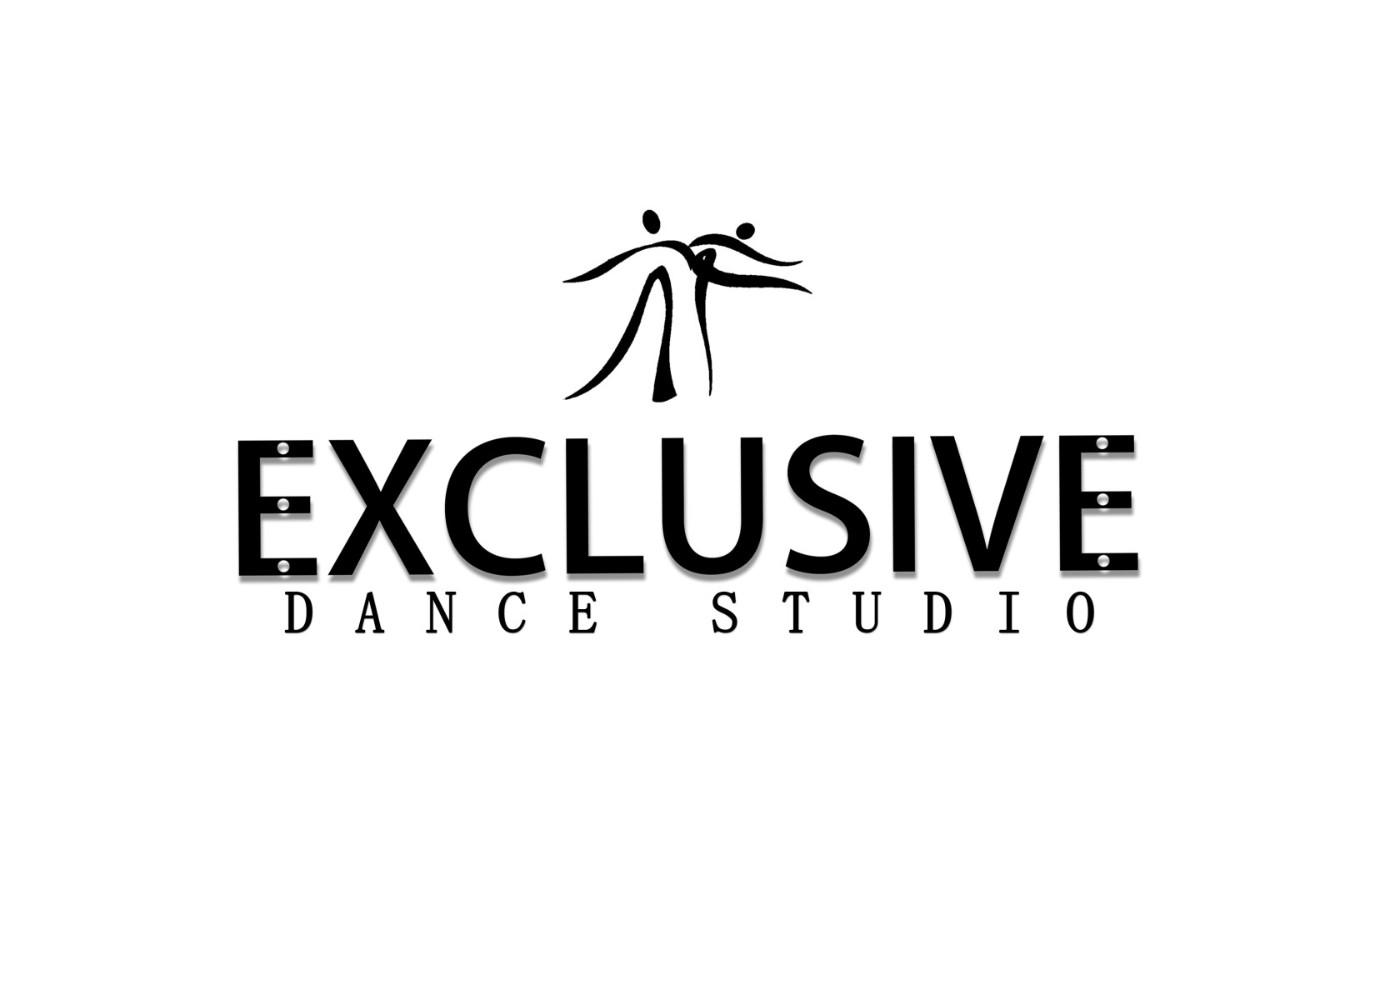 Exclusiv dance studio